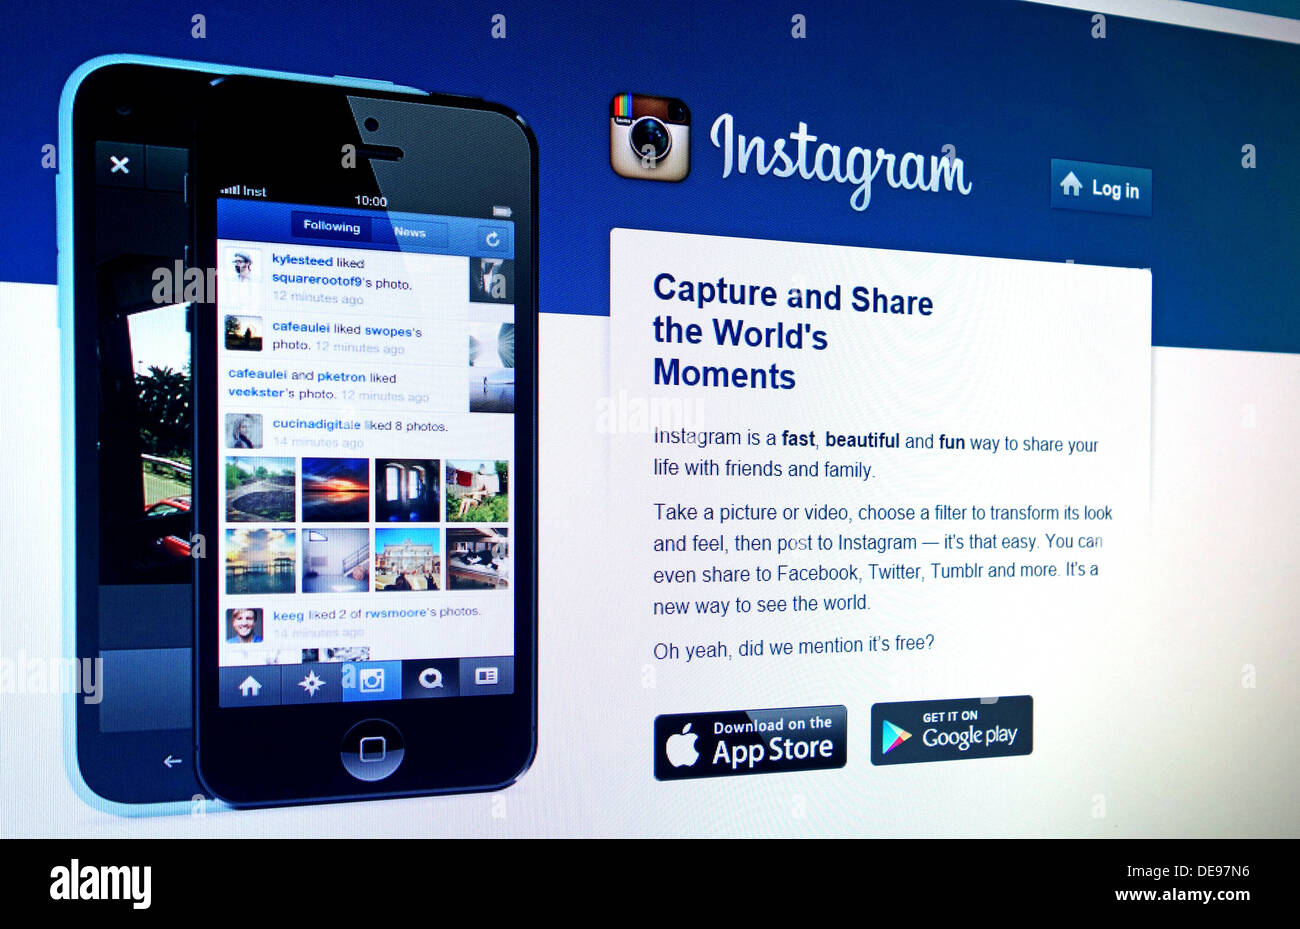 Instagram web site - Stock Image